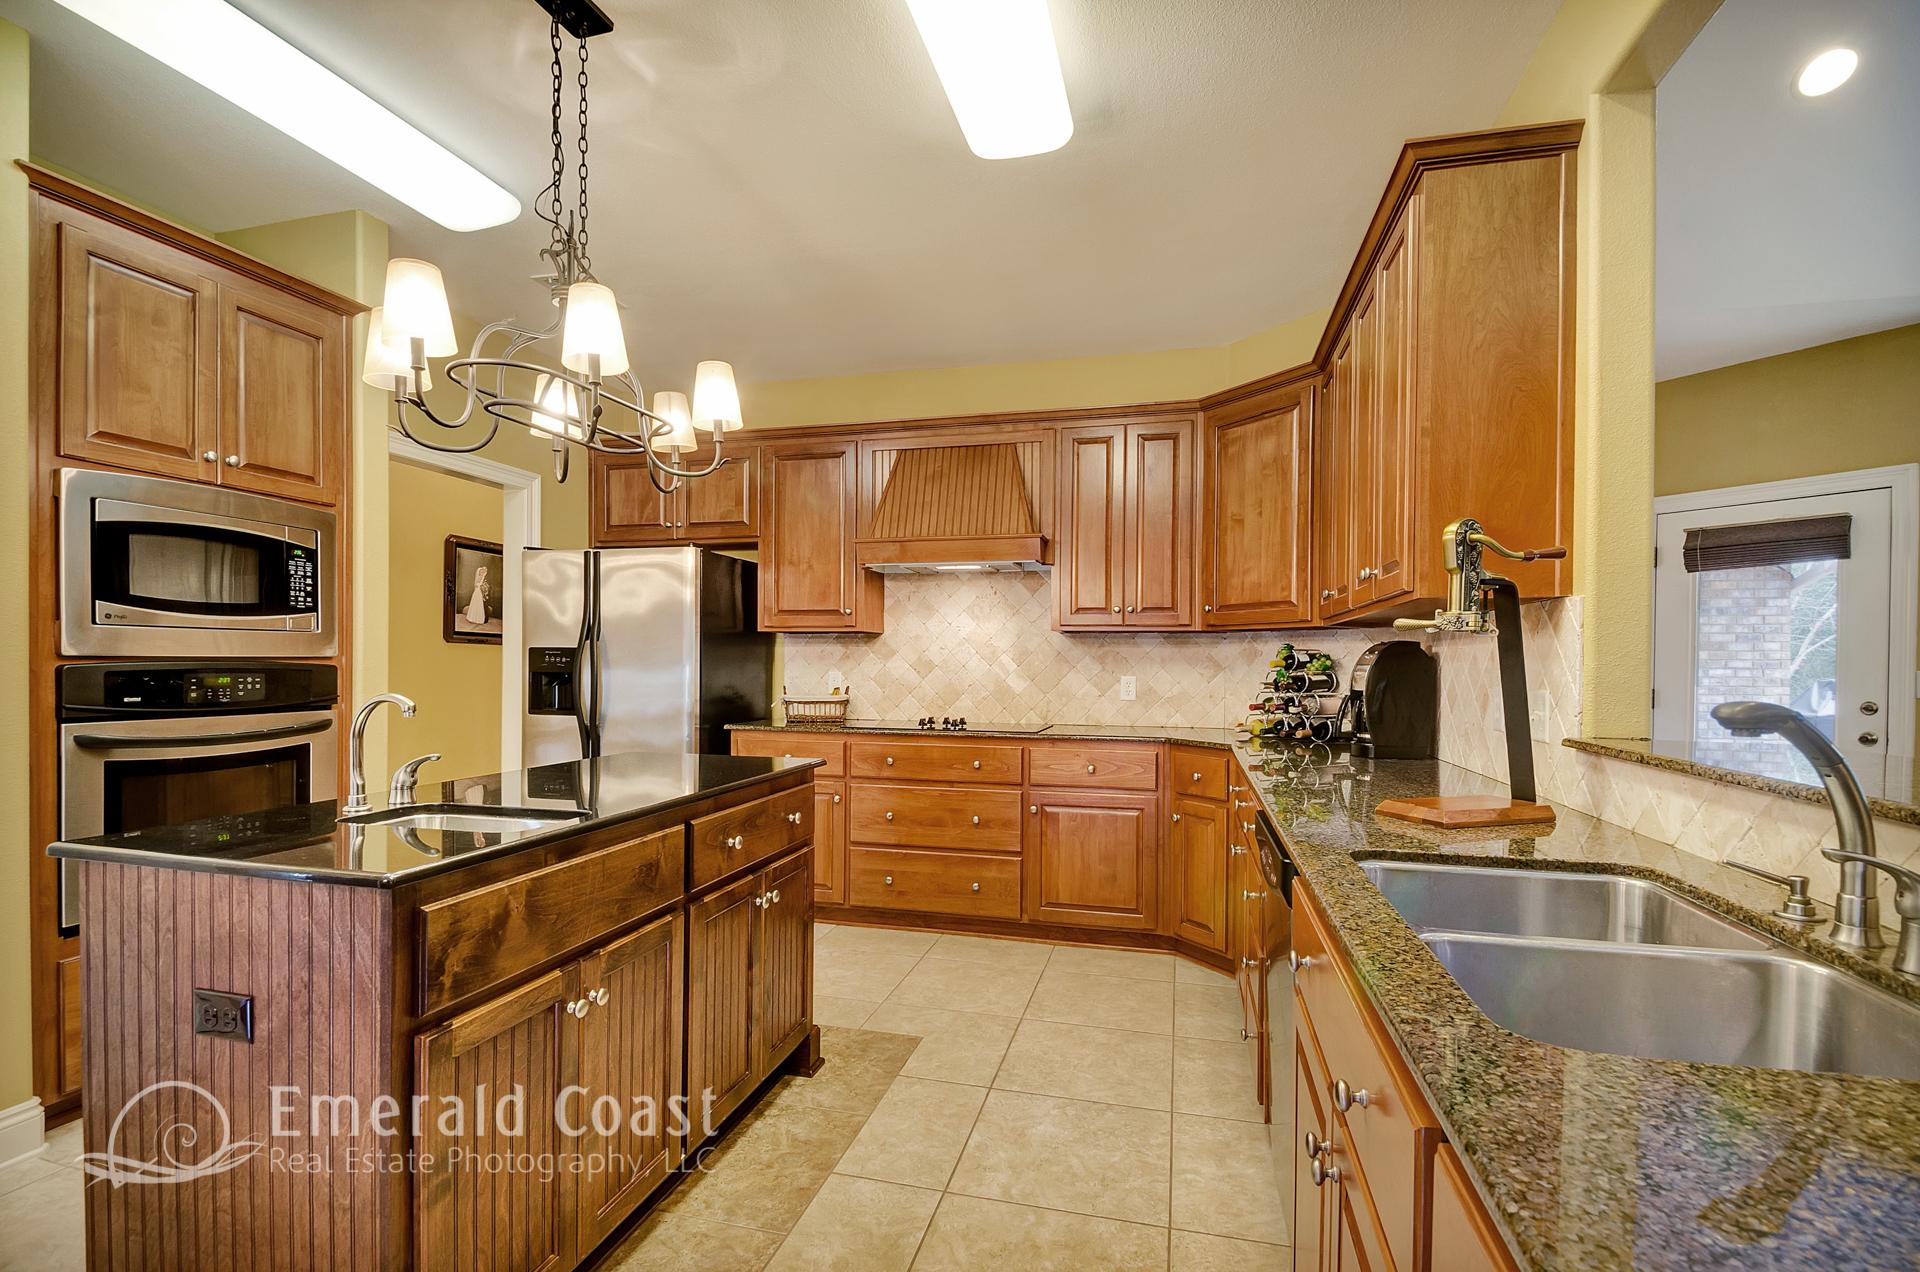 Craigslist Fort Walton Beach >> Emerald Coast Real Estate Photography » Pace Real Estate ...